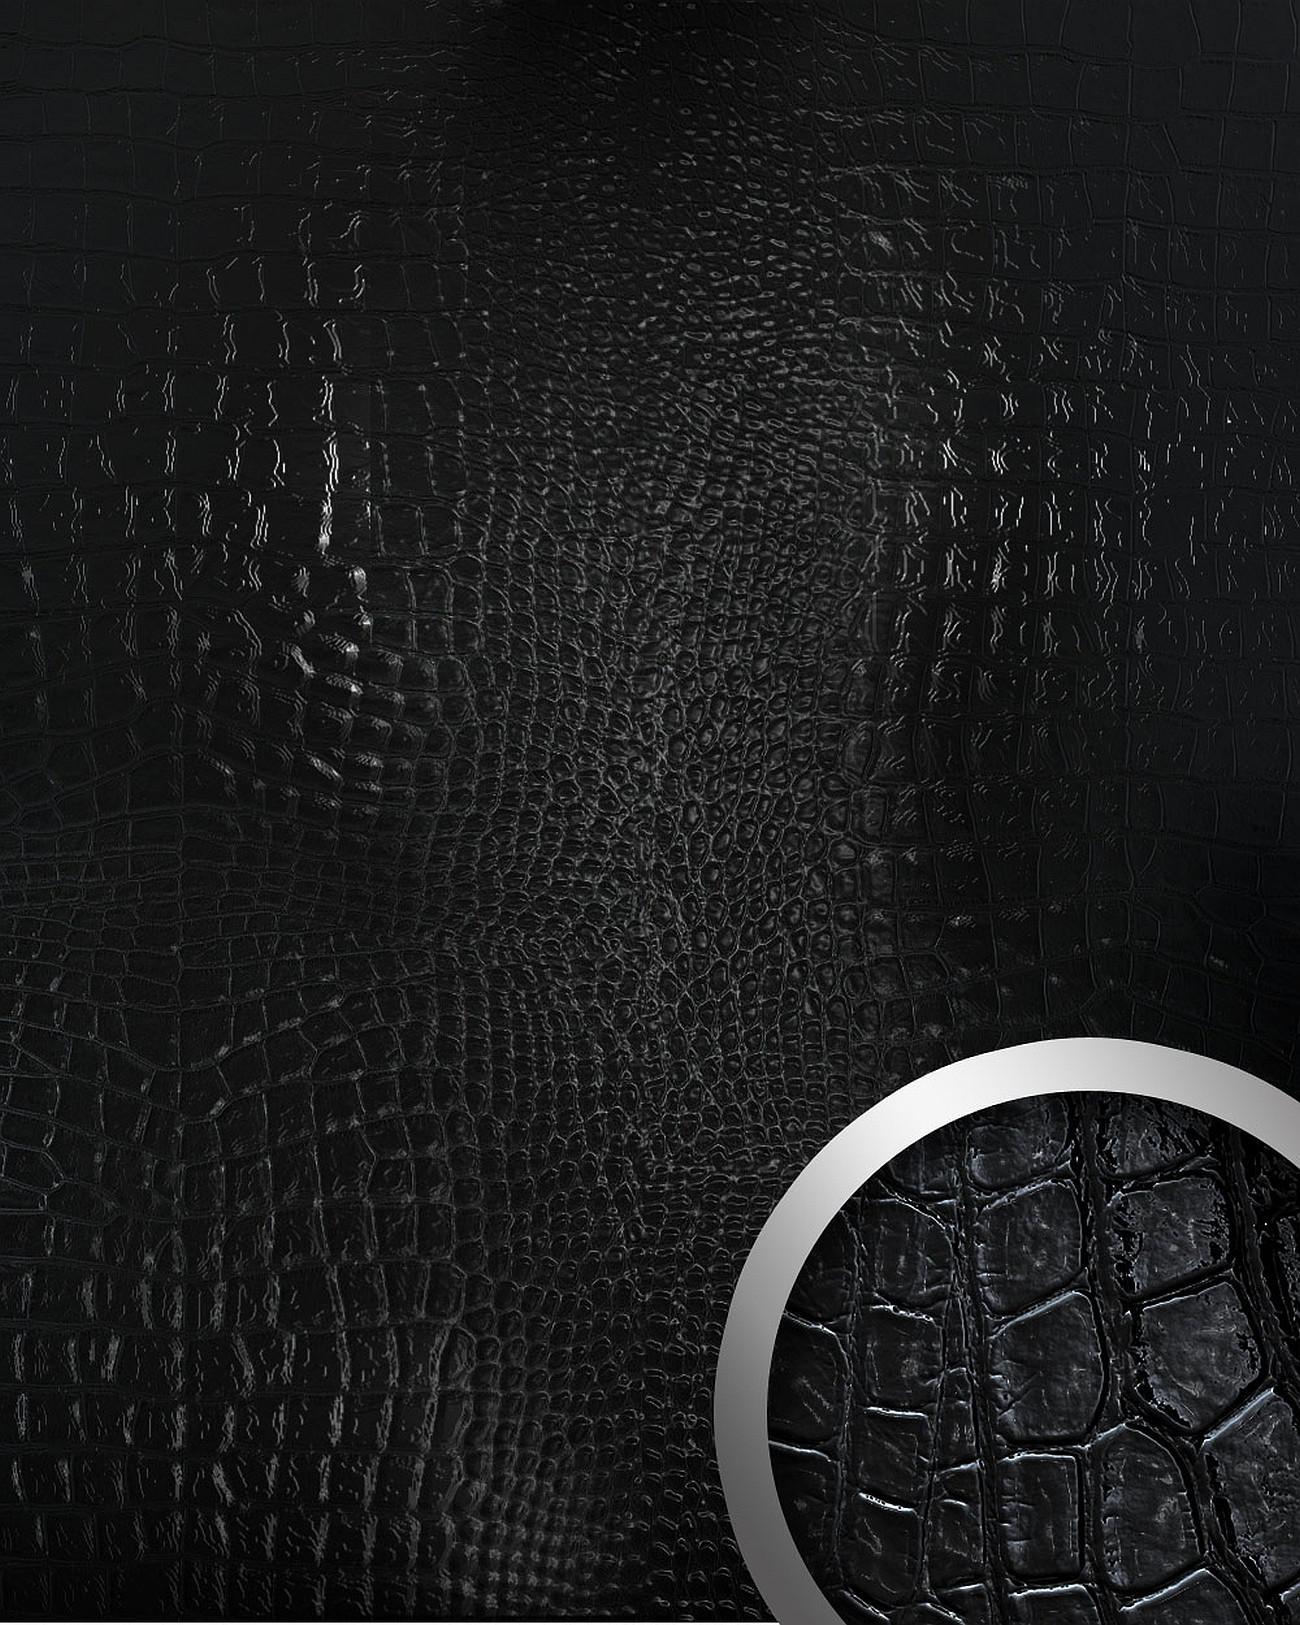 Wandpaneel Platte 3D Wandverkleidung WallFace 13826 CROCONOVA Design  Blickfang Dekor Selbstklebende Tapete Schwarz | 2, ...